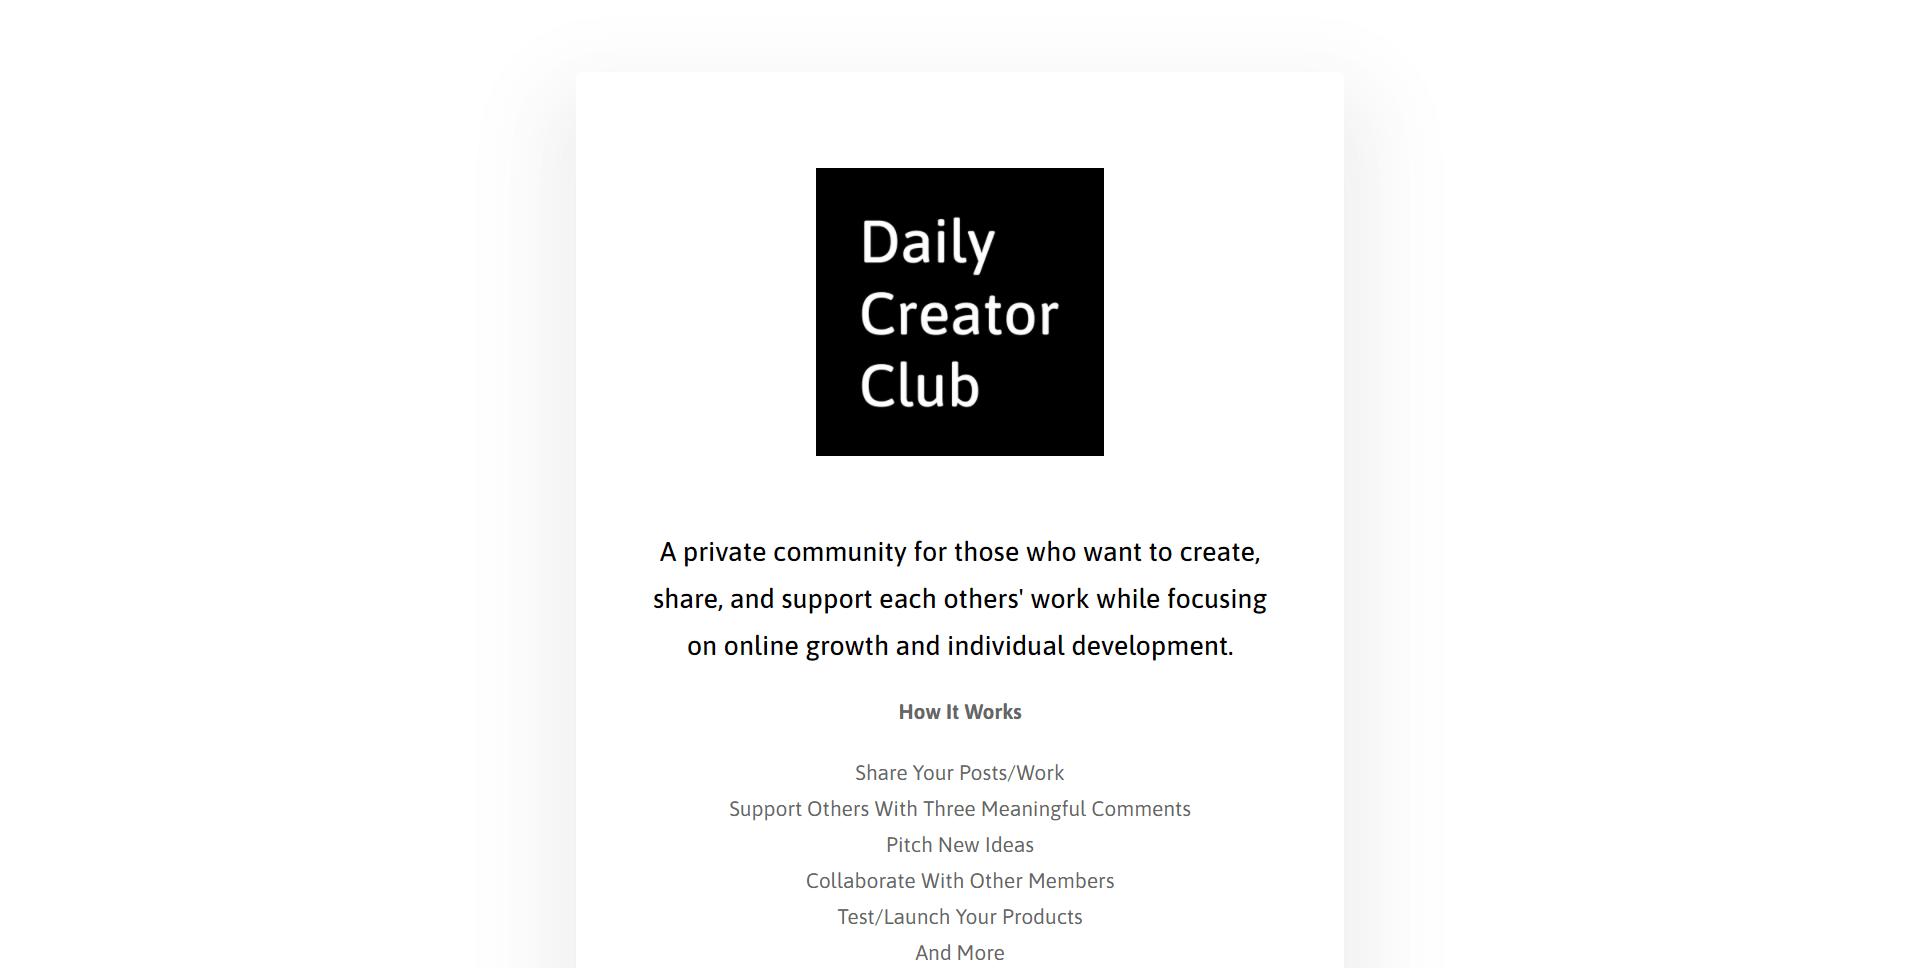 Daily Creator Club